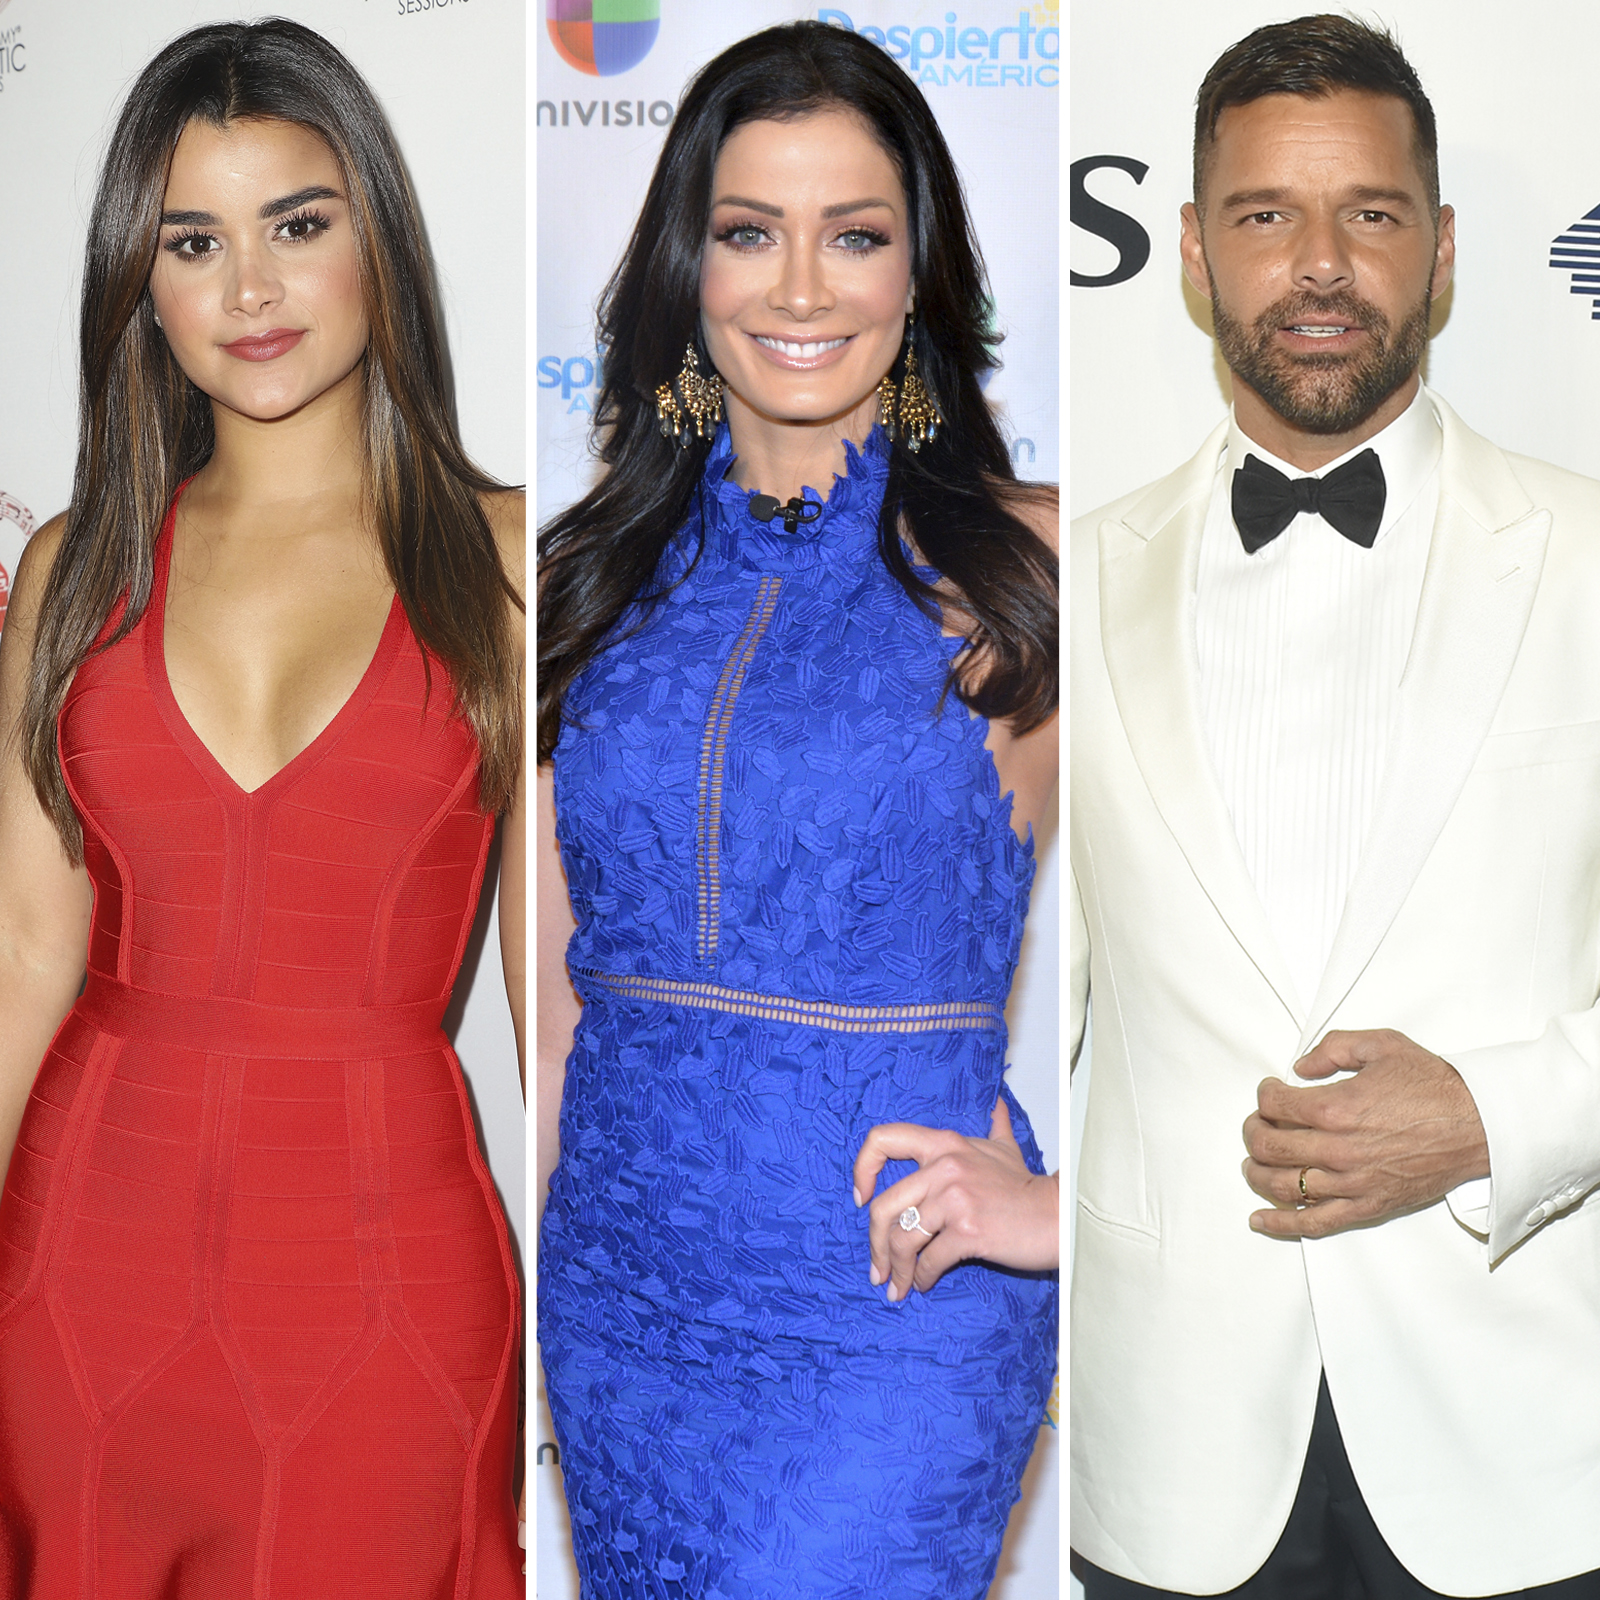 Clarissa Molina, Dayanara Torres y Ricky Martin